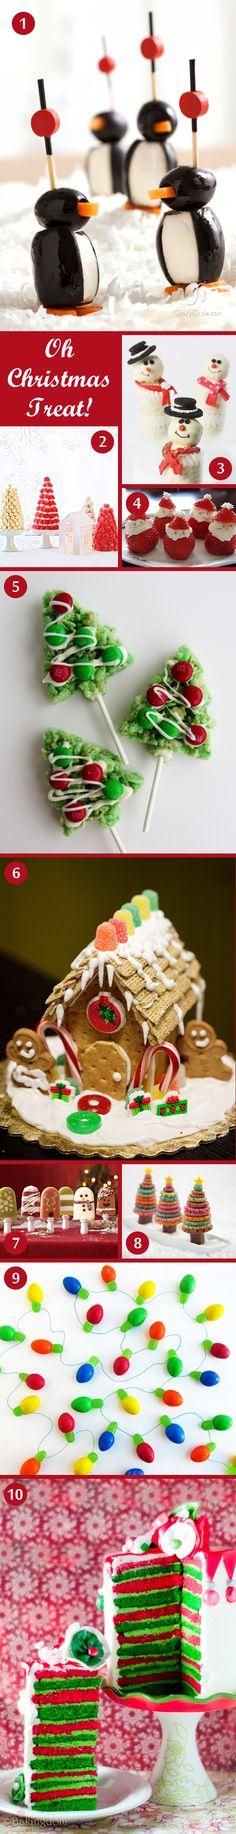 Oh Christmas Treats! Christmas party food ideas